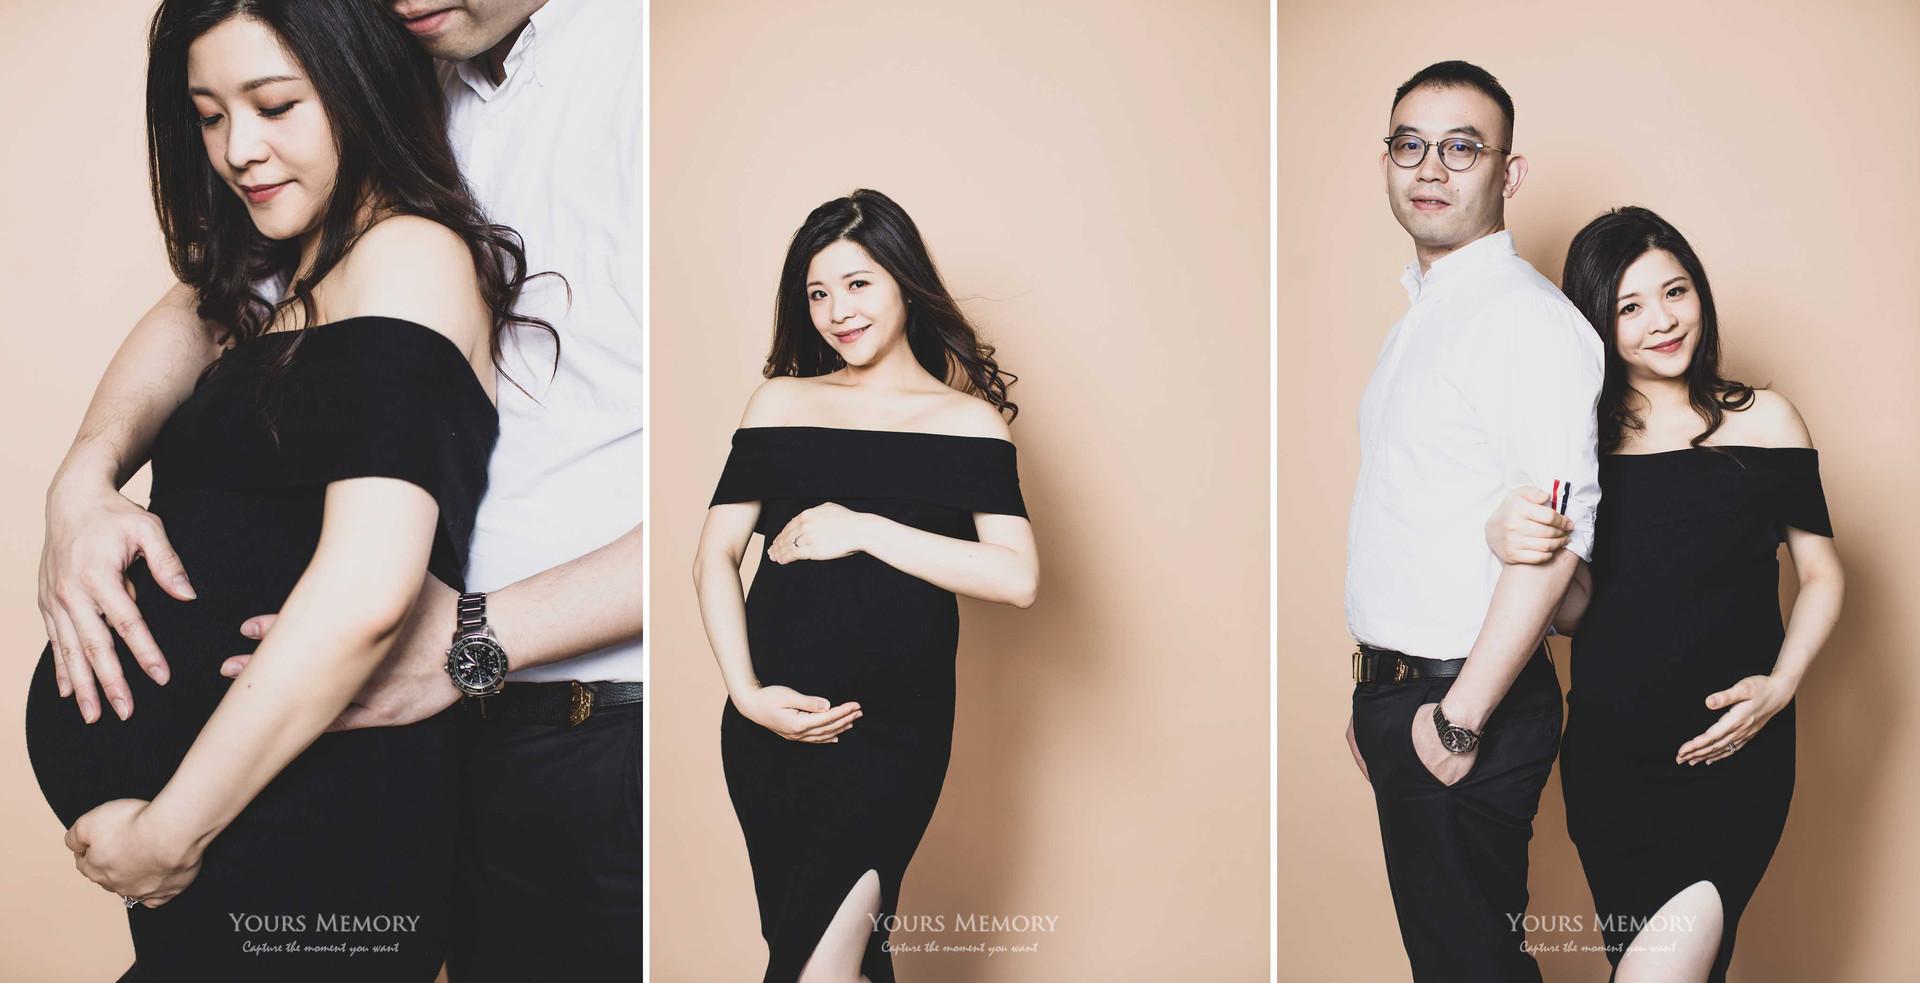 pregnancy_introduction_2-2019_3.jpg